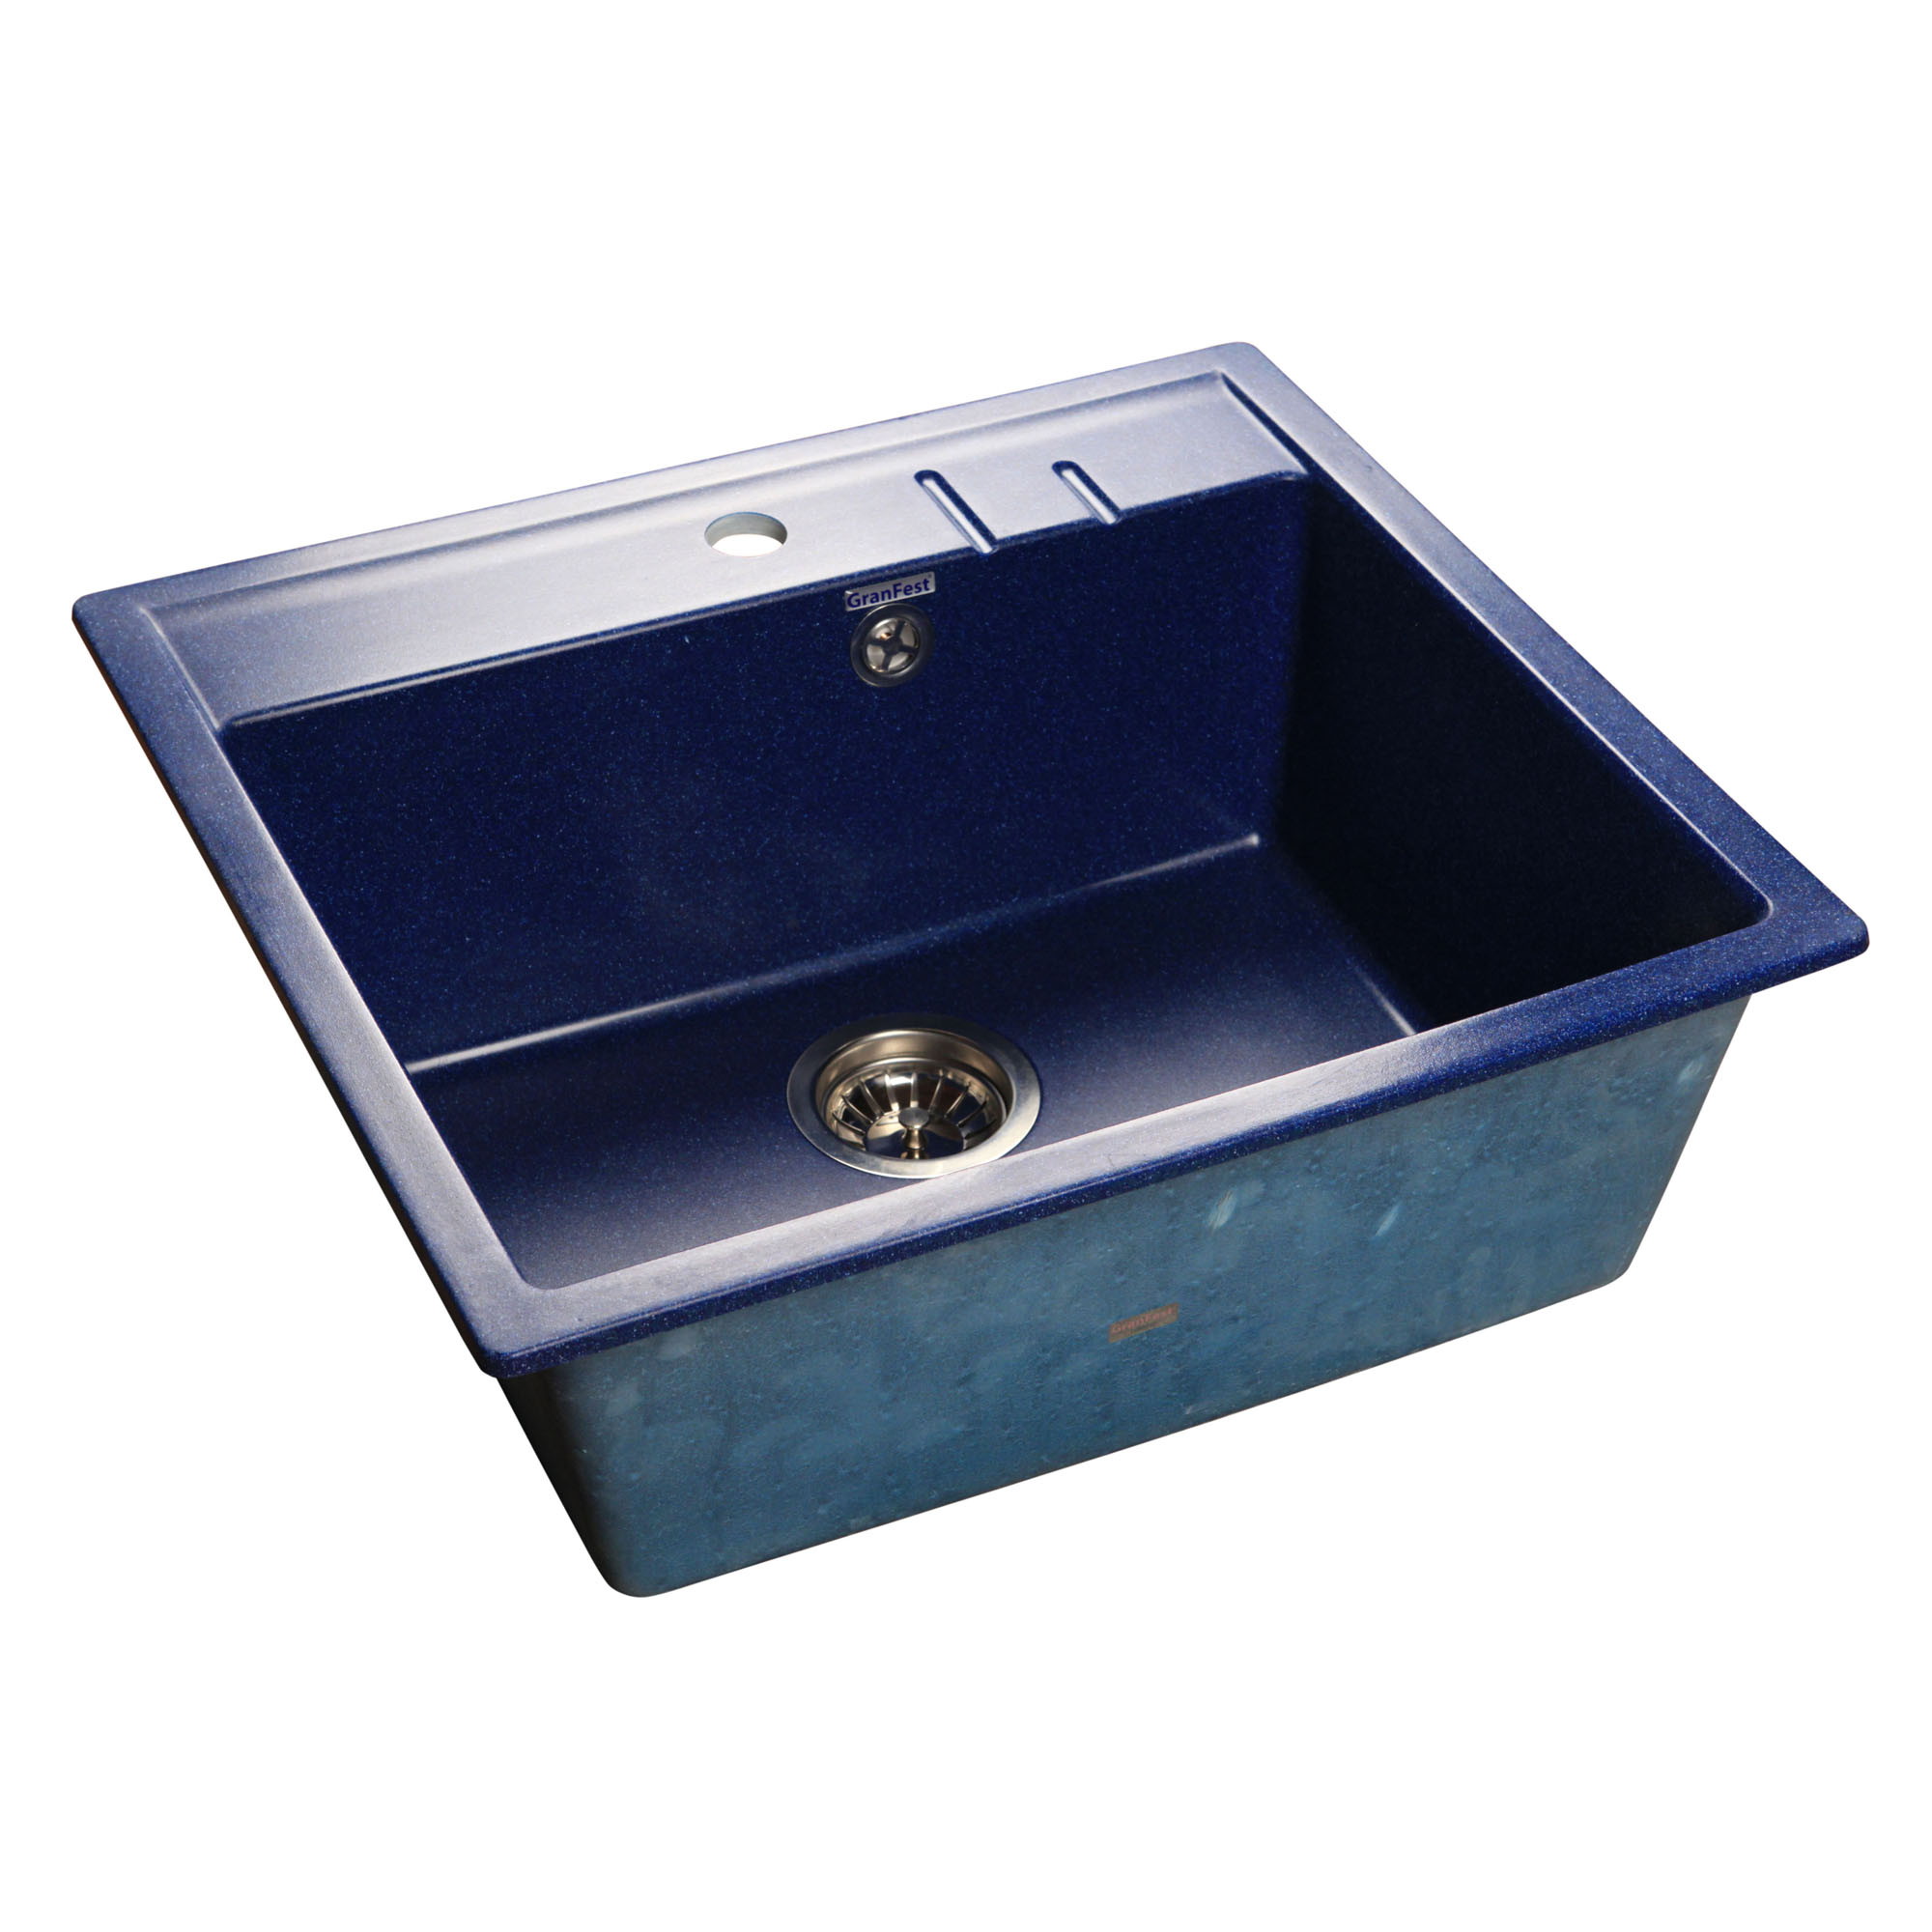 Кухонная мойка GranFest Quadro GF-Q560 синий цена